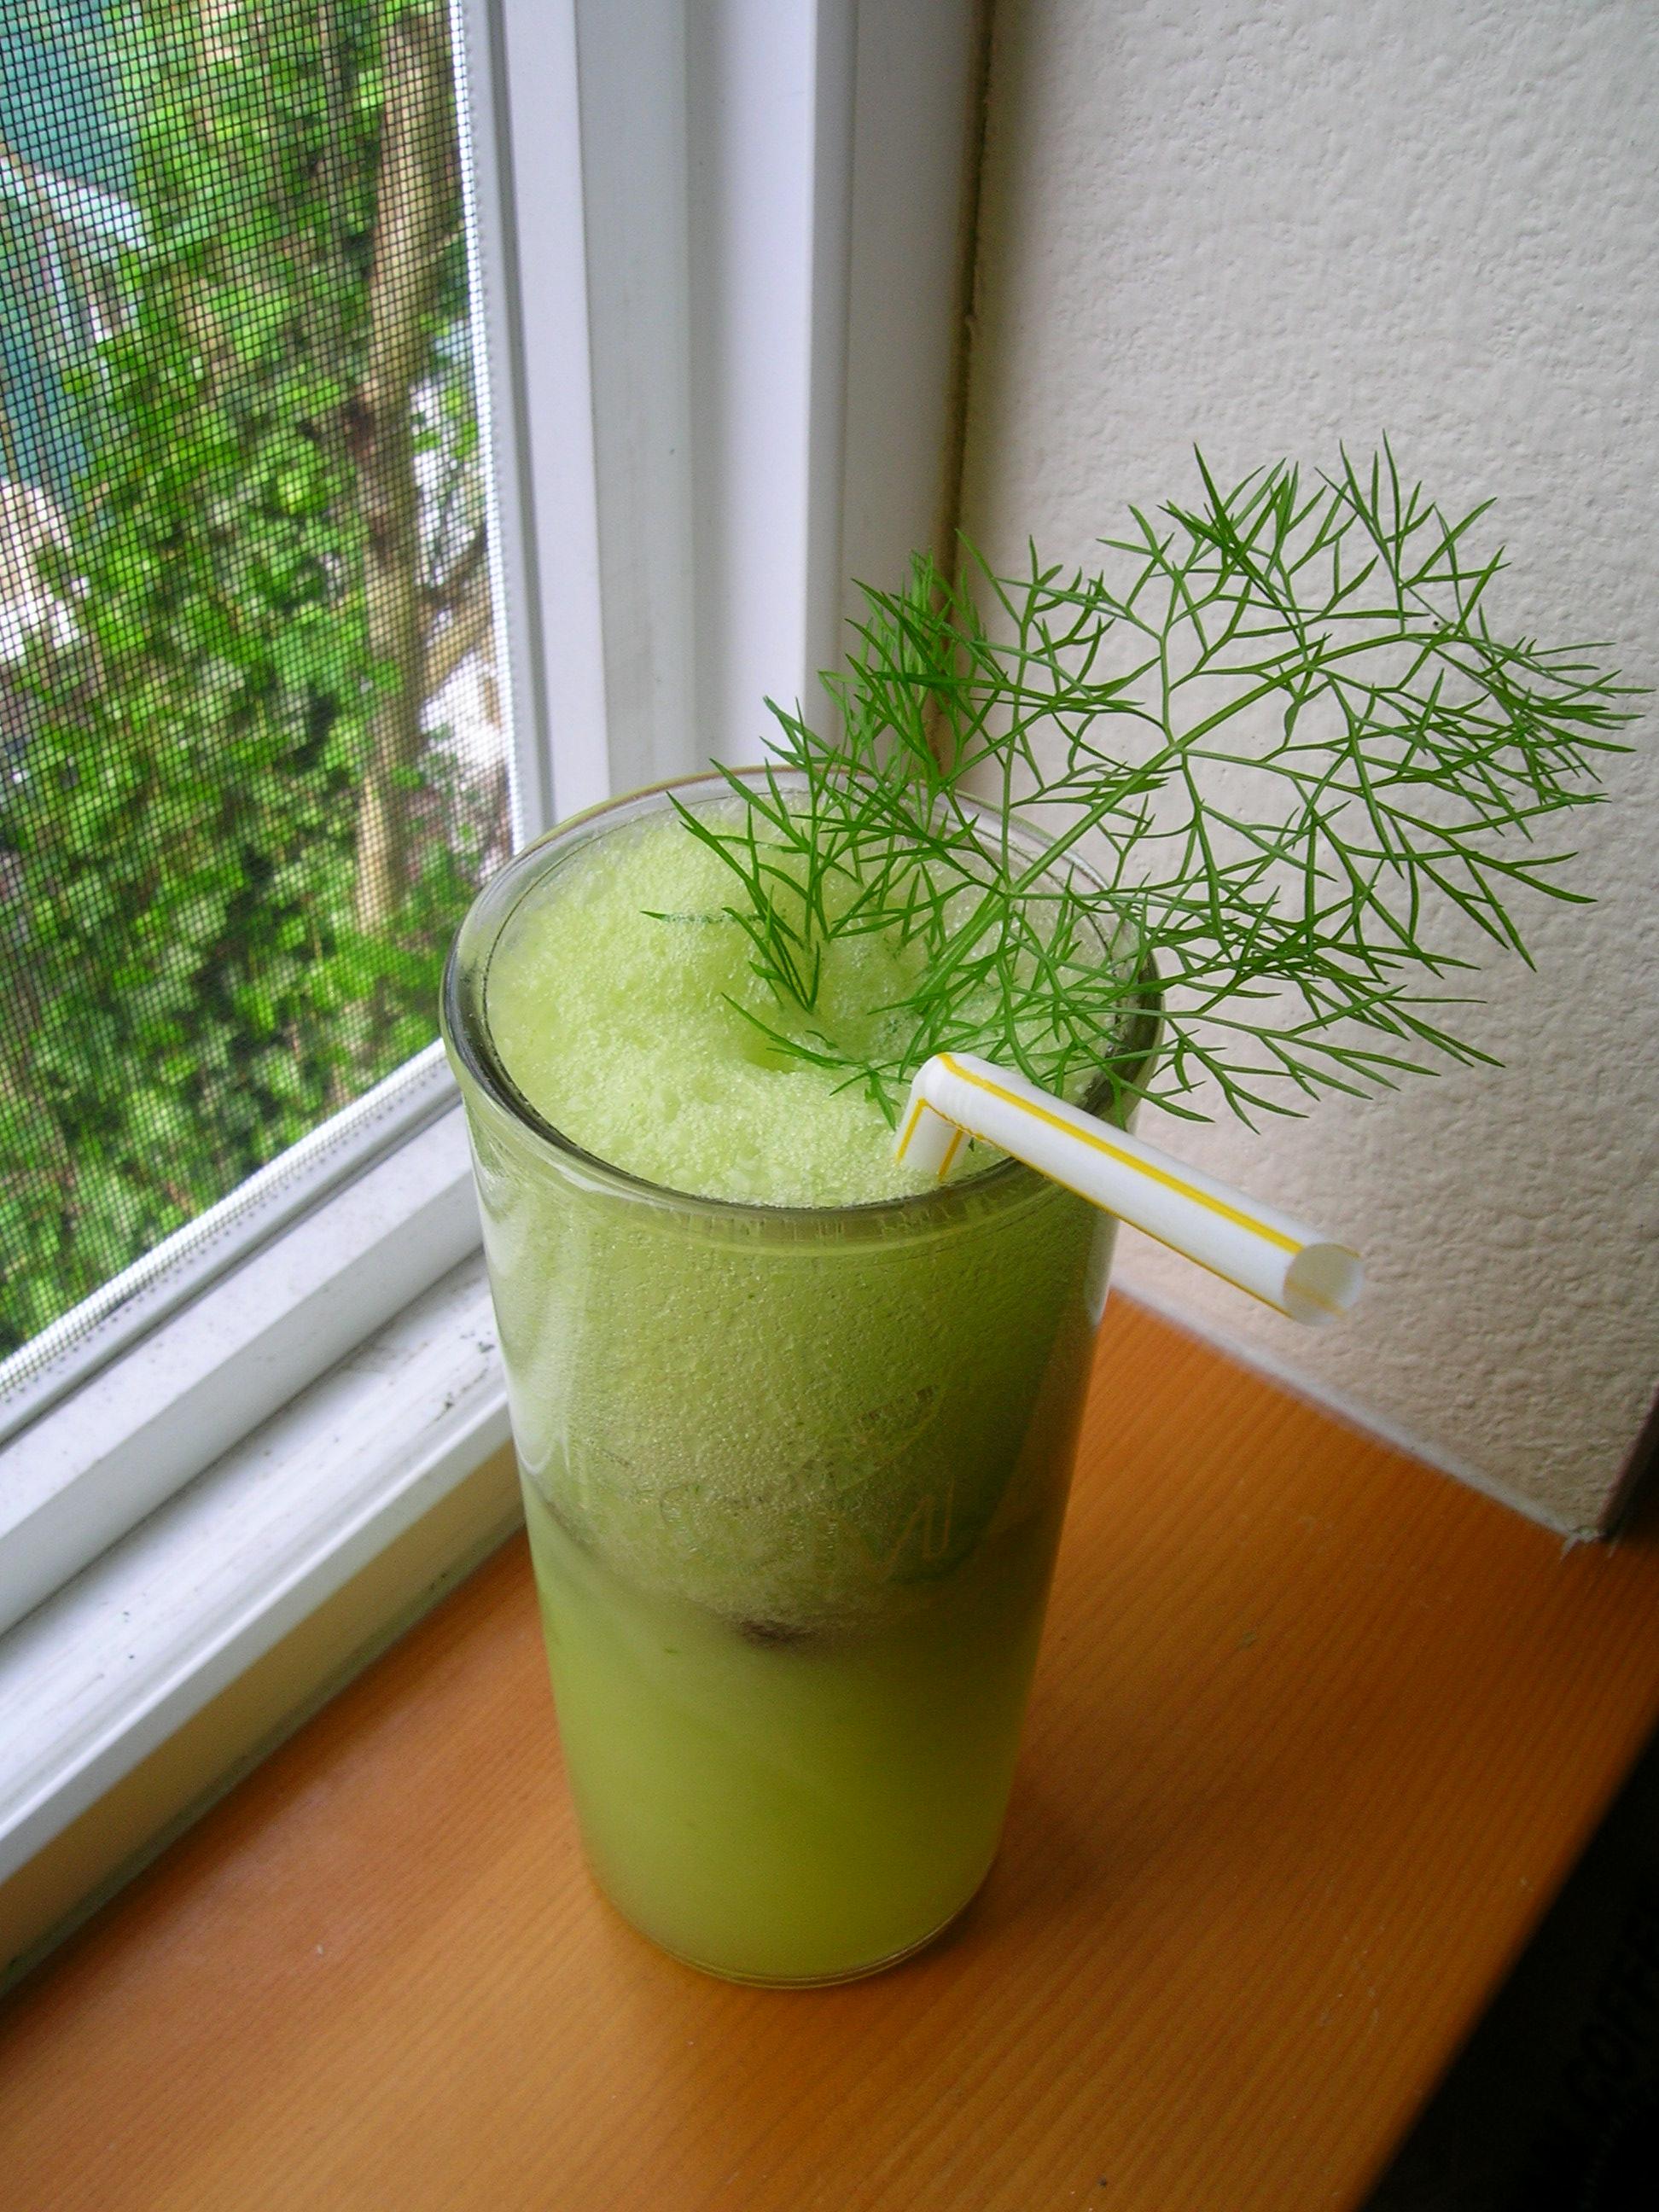 Cucumber-Fennel Fizz